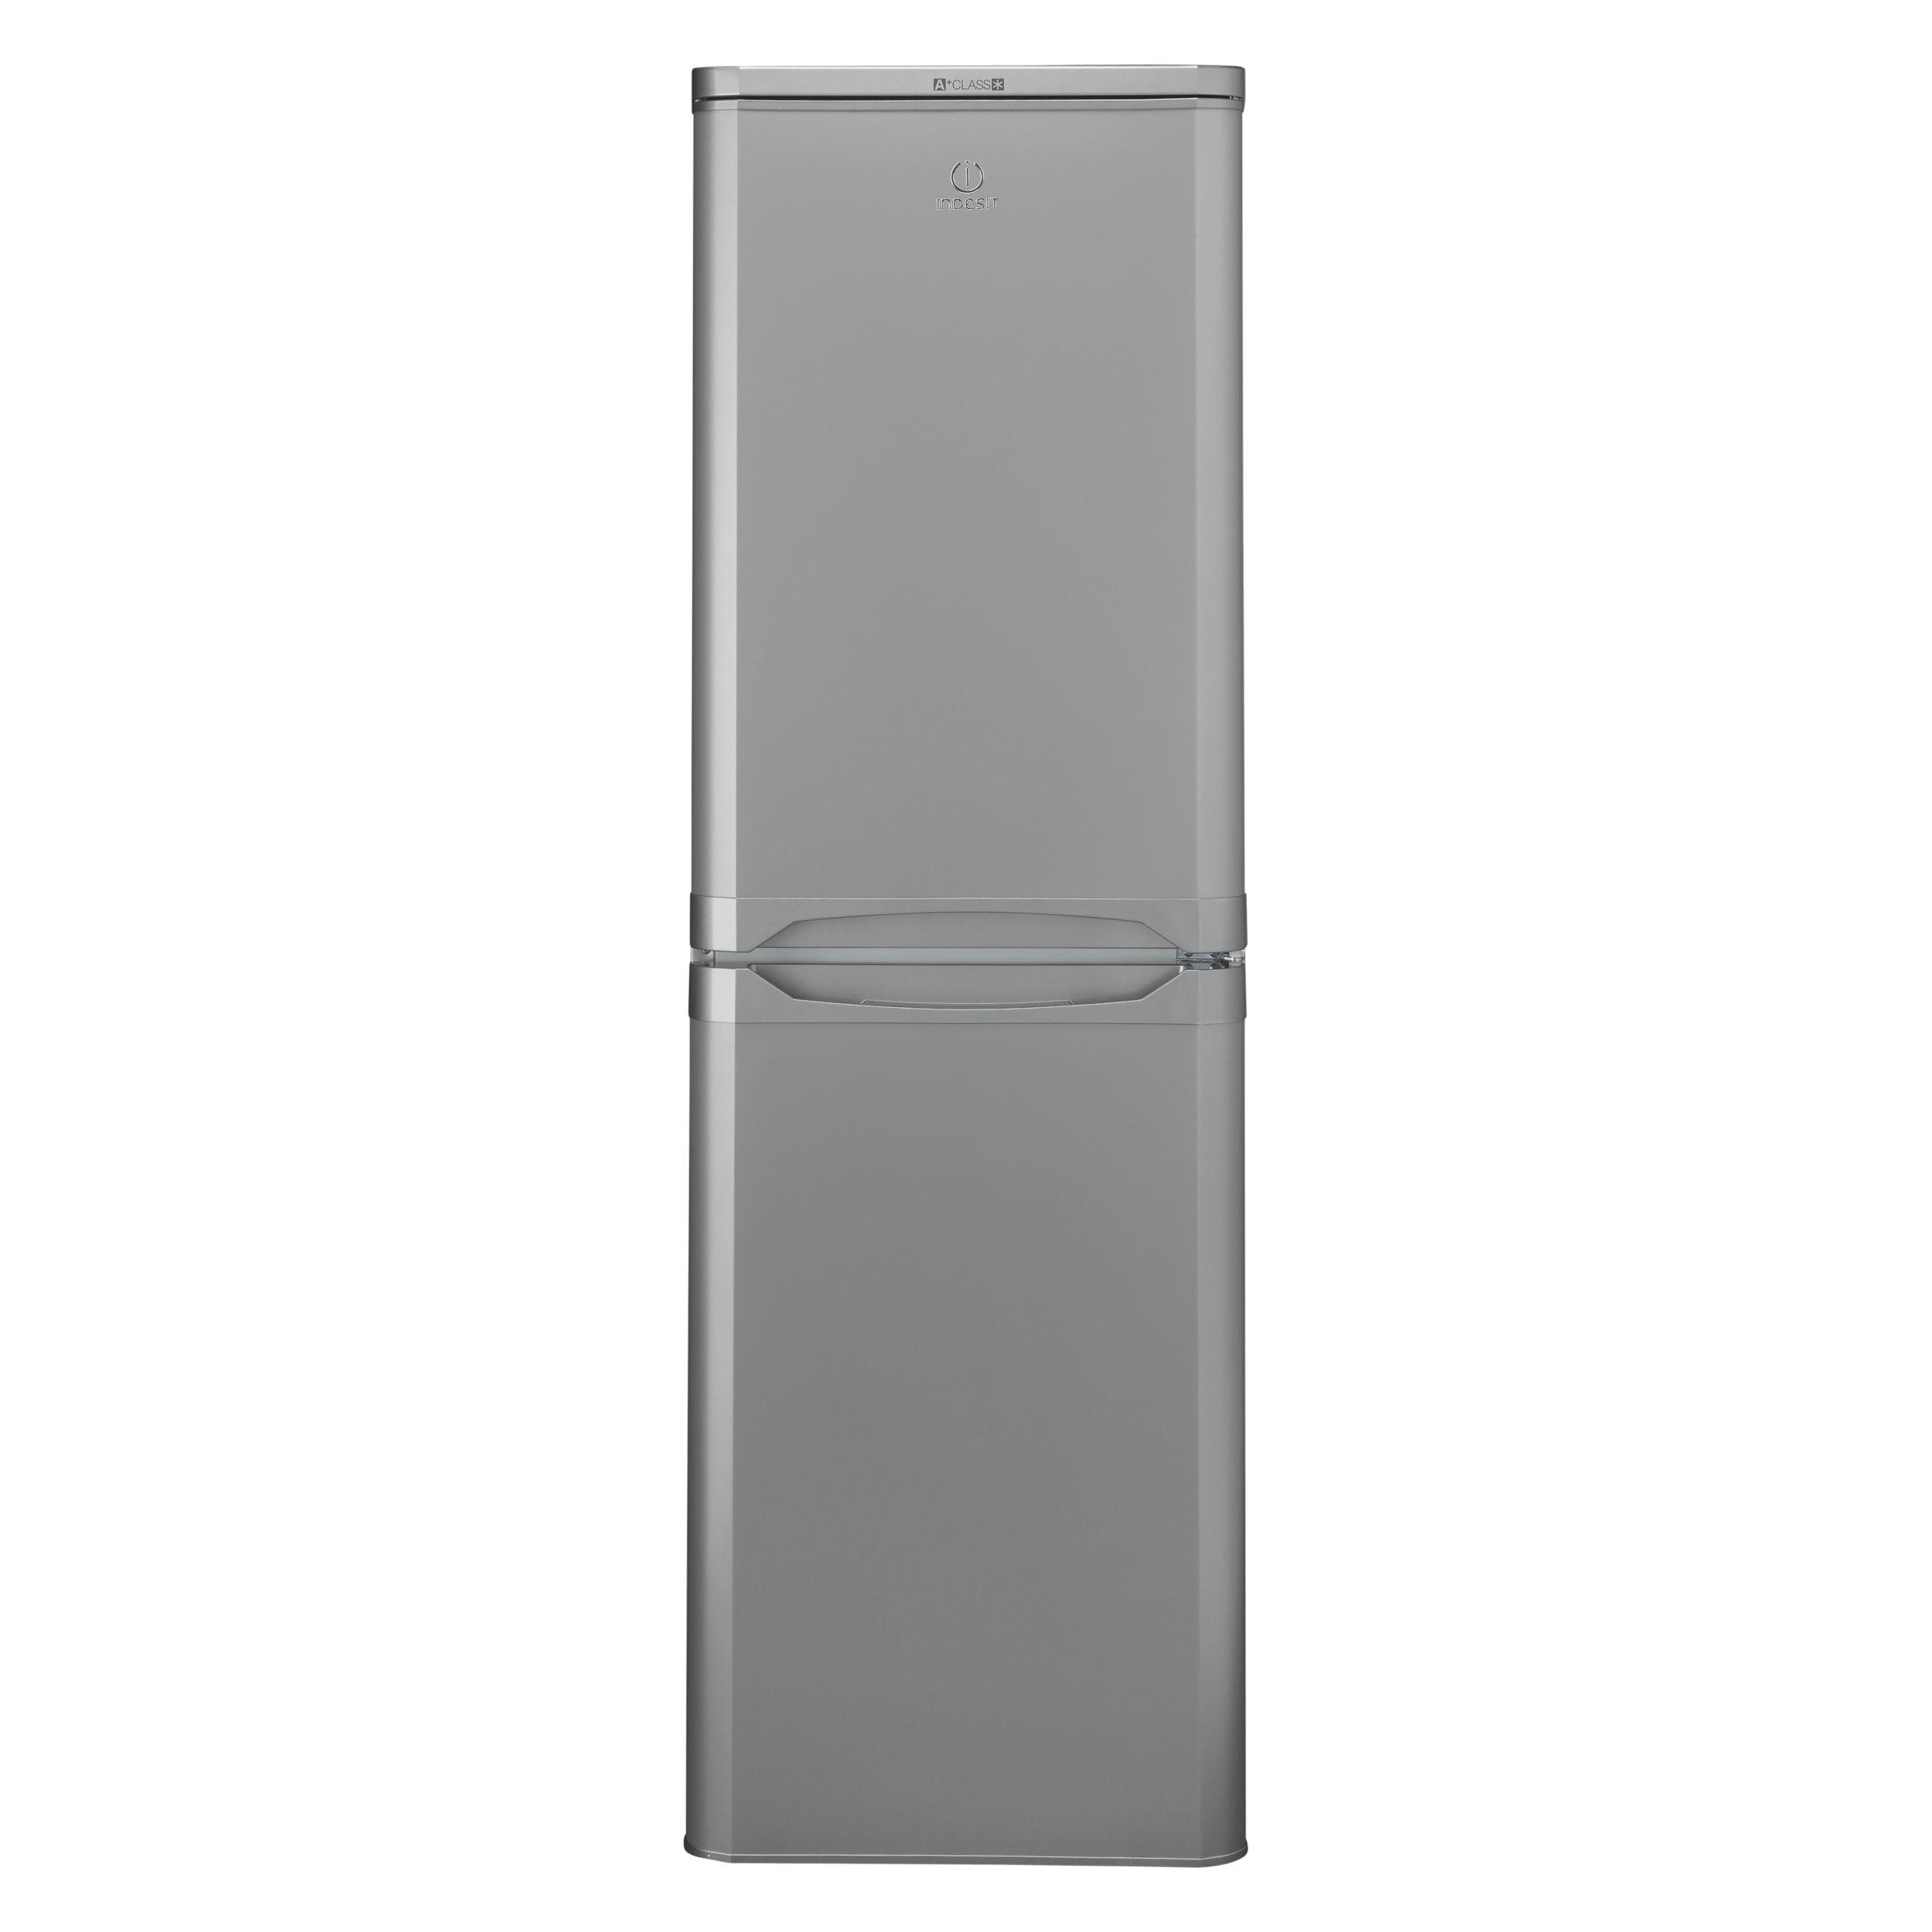 john lewis fridge freezers. Black Bedroom Furniture Sets. Home Design Ideas